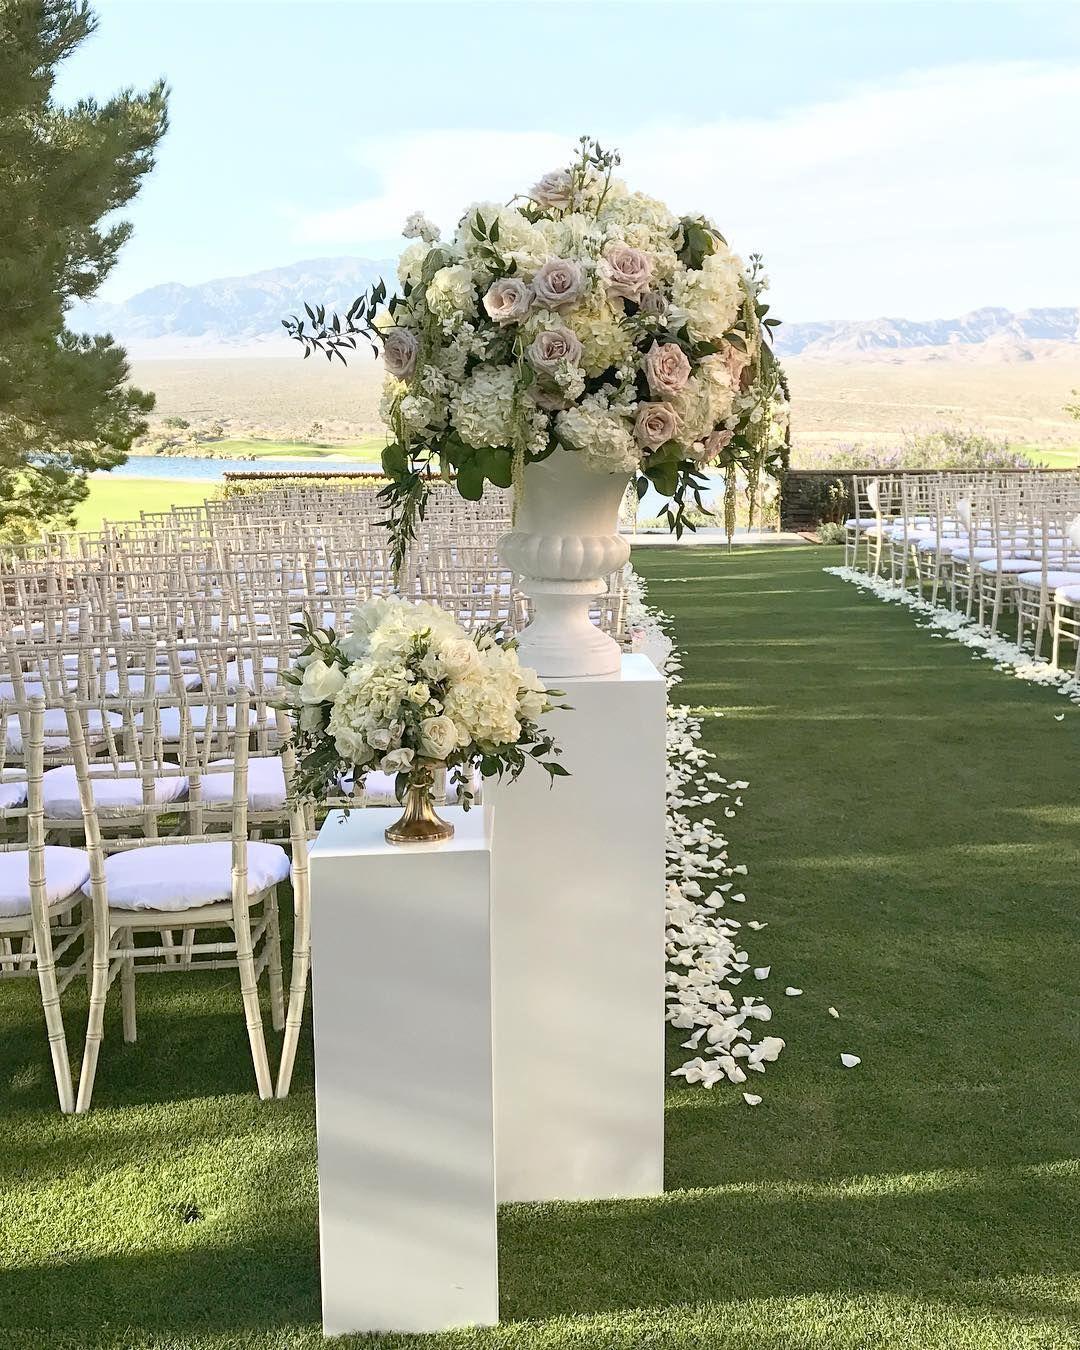 Stylish Wedding Ceremony Decor: Pin By SPANISH STYLE HOMES On Ceremony